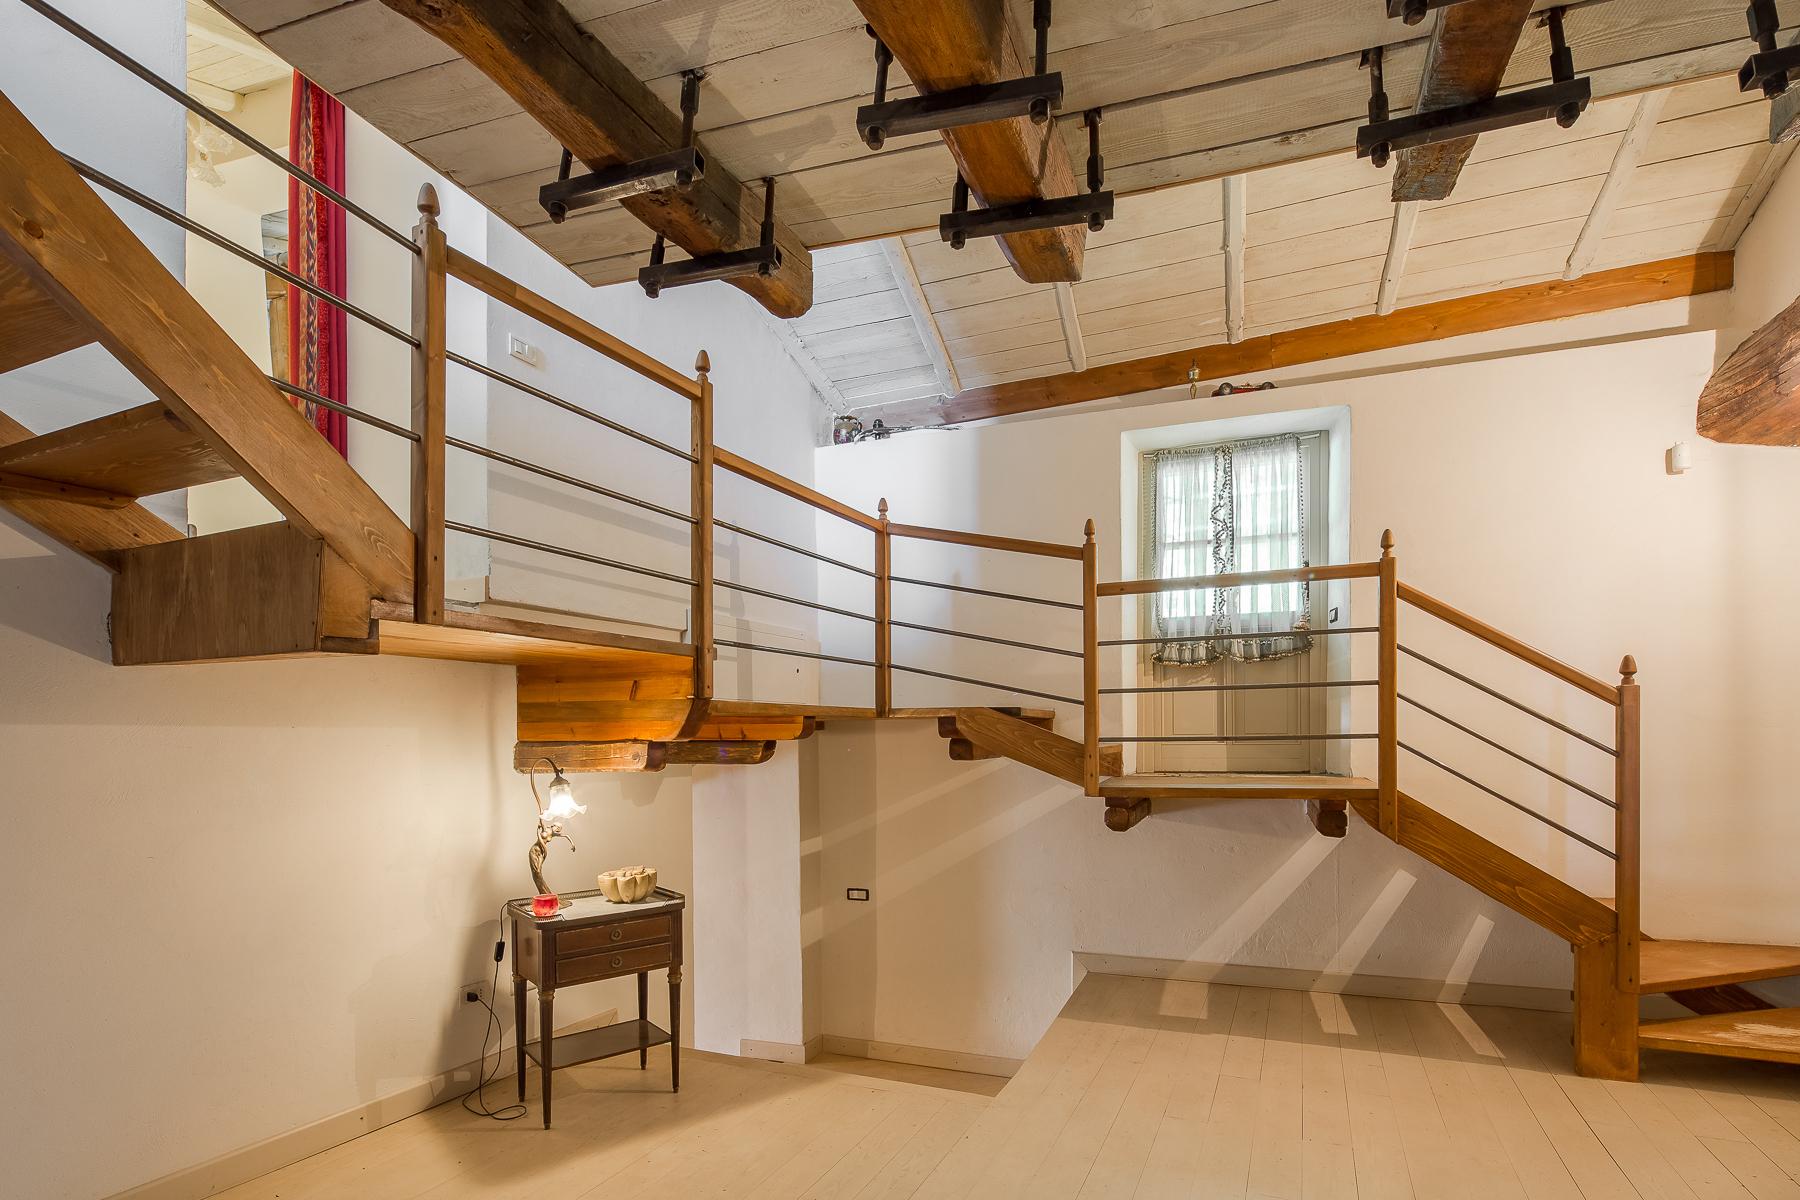 Casa indipendente in Vendita a Caprino Bergamasco: 5 locali, 500 mq - Foto 4